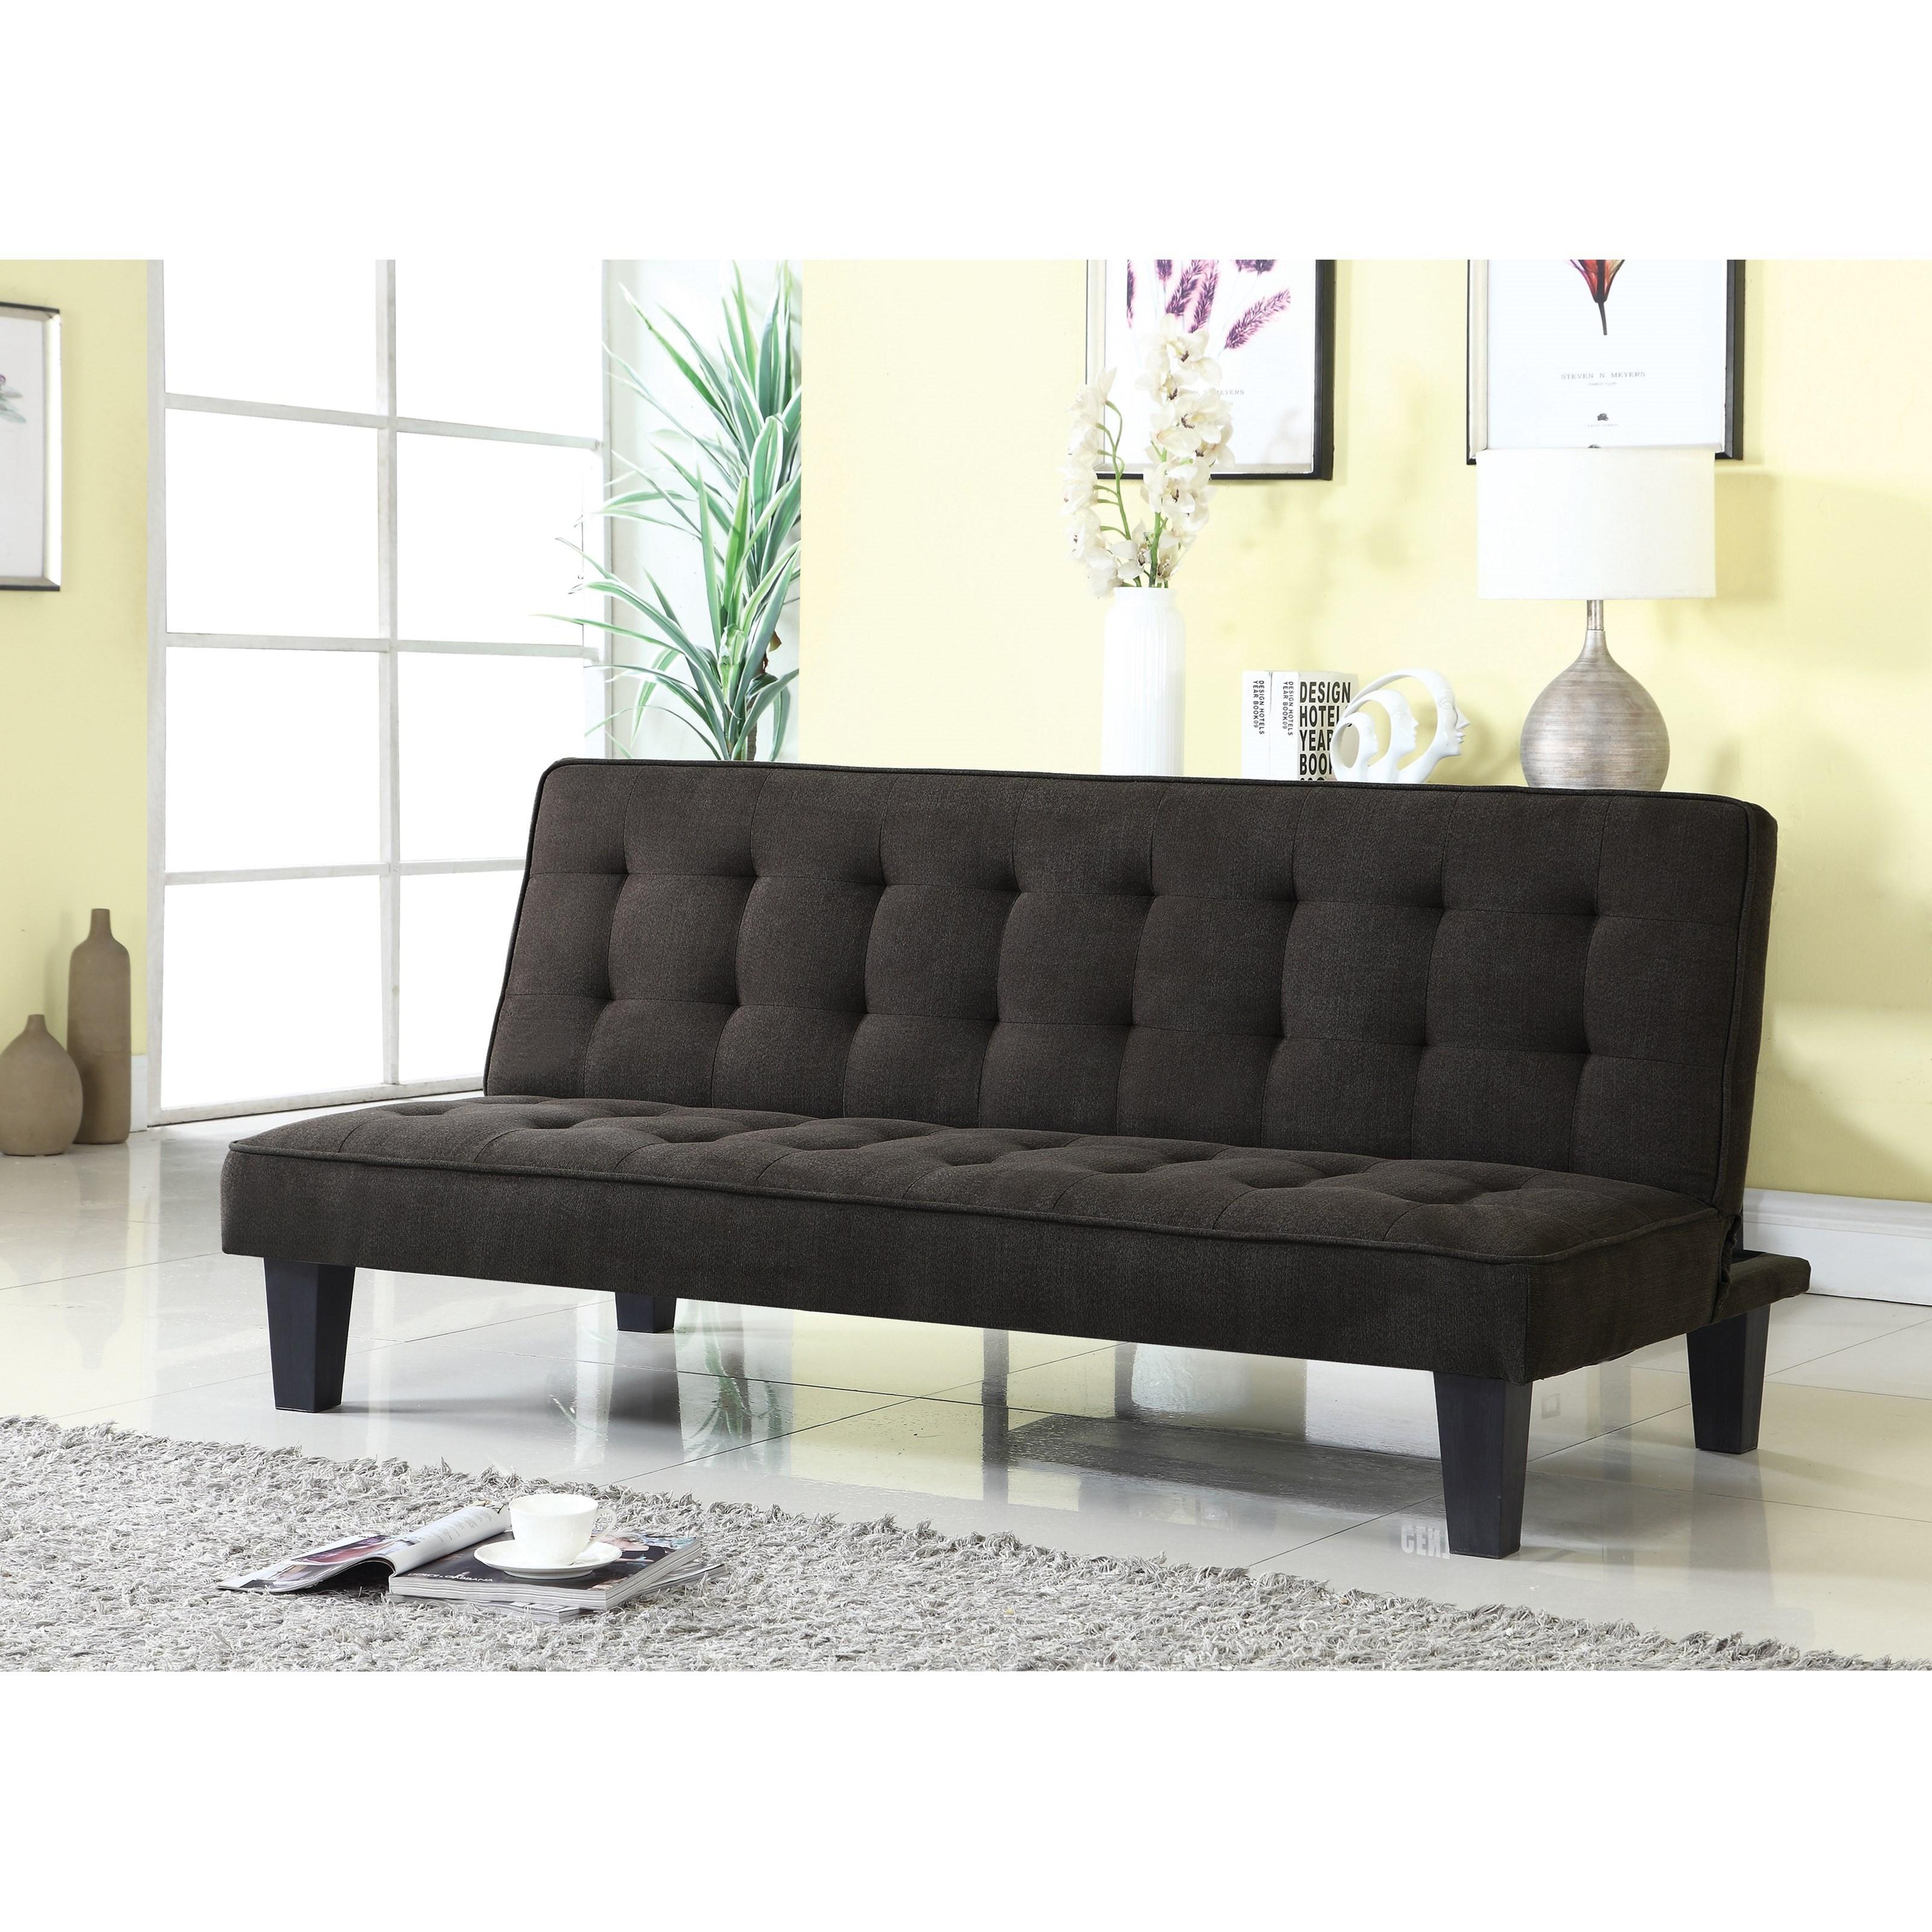 Coaster Futons Sofa Bed - Item Number: 503958